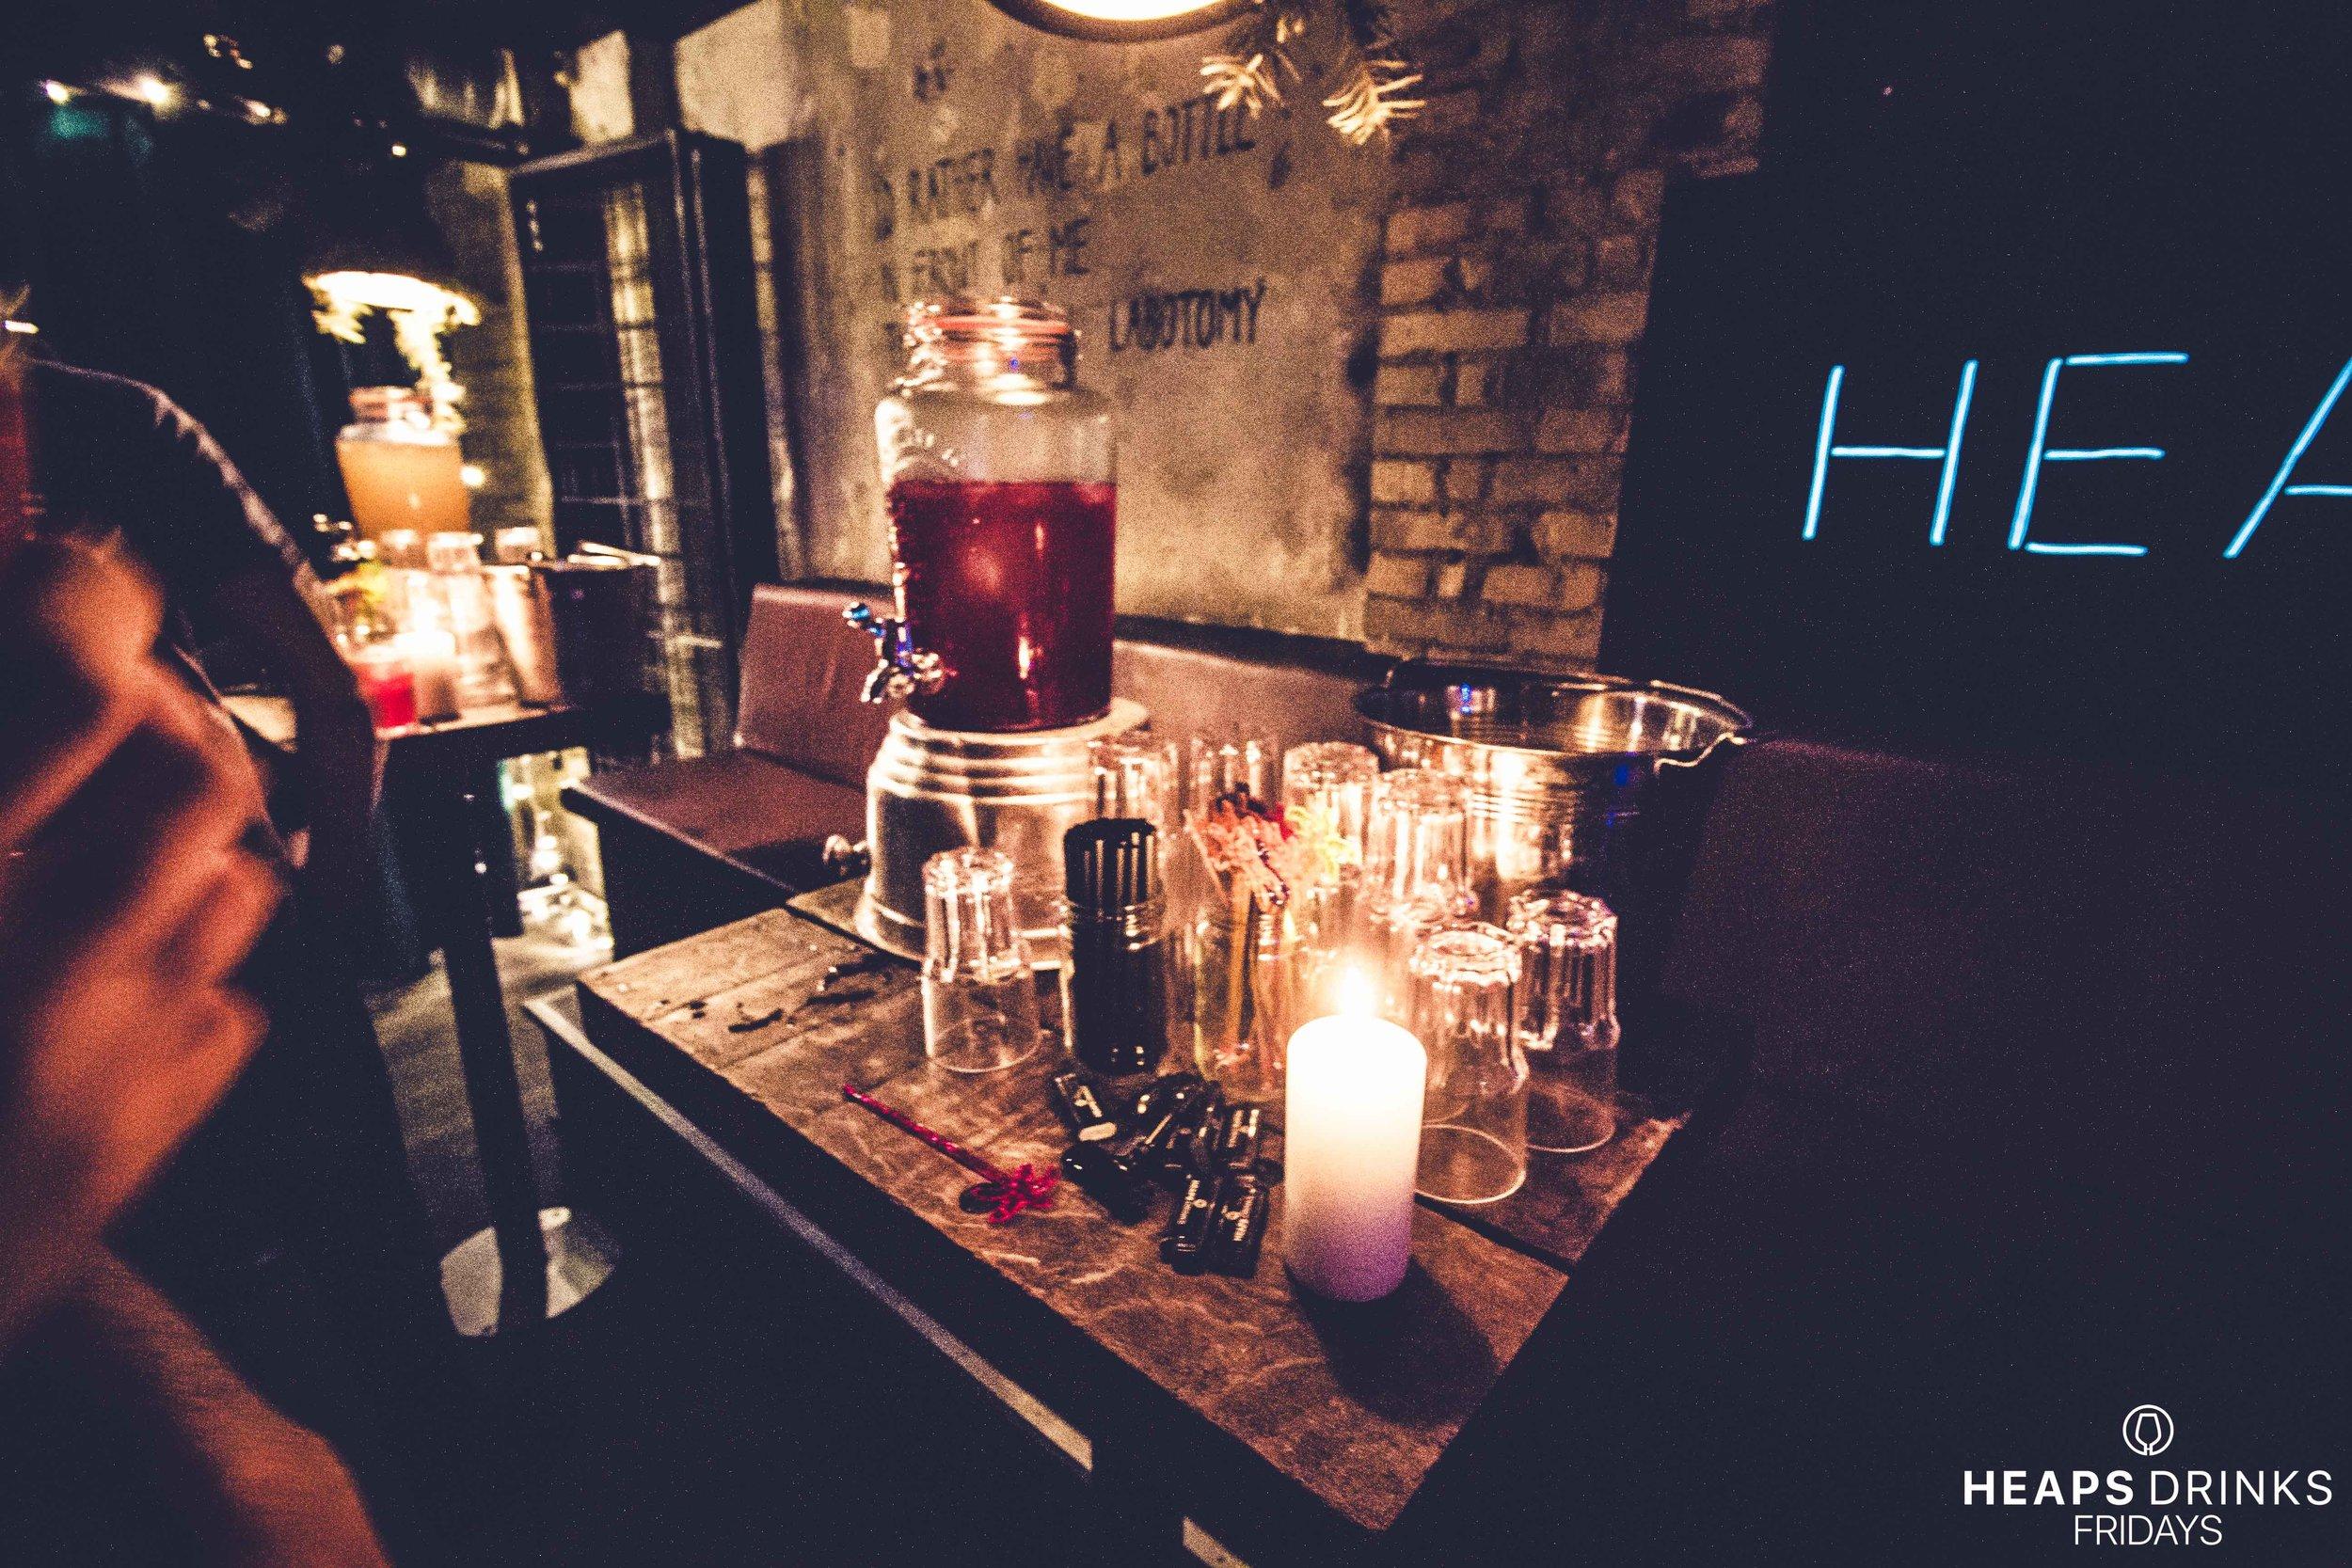 Heaps_drinks_5.jpg